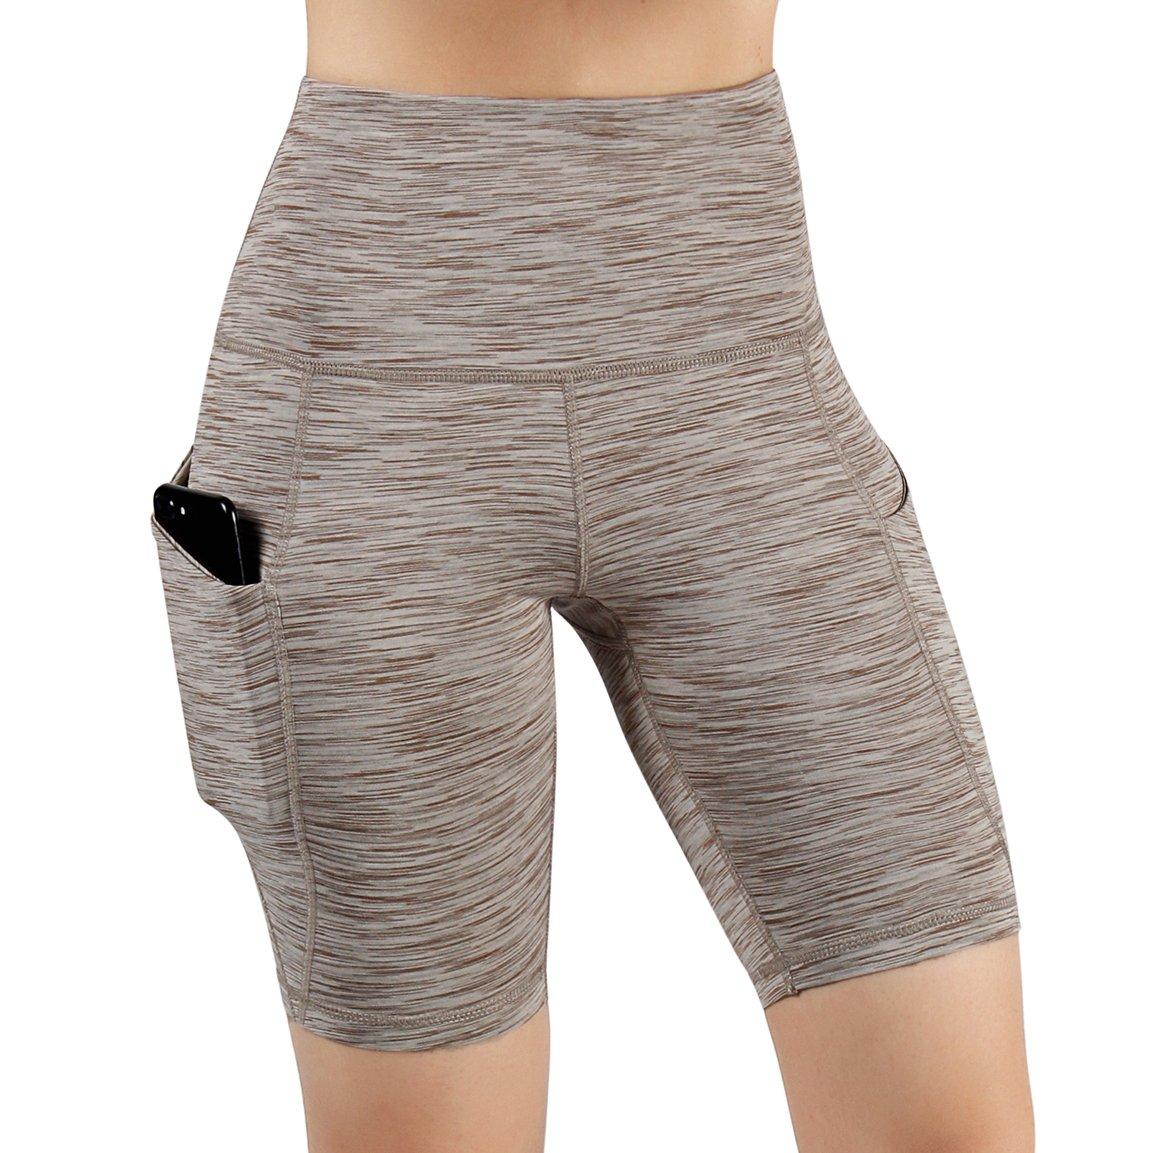 Yogapocketshots626spacedyebrown ODODOS High Waist Out Pocket Yoga Short Tummy Control Workout Running Athletic Non SeeThrough Yoga Shorts